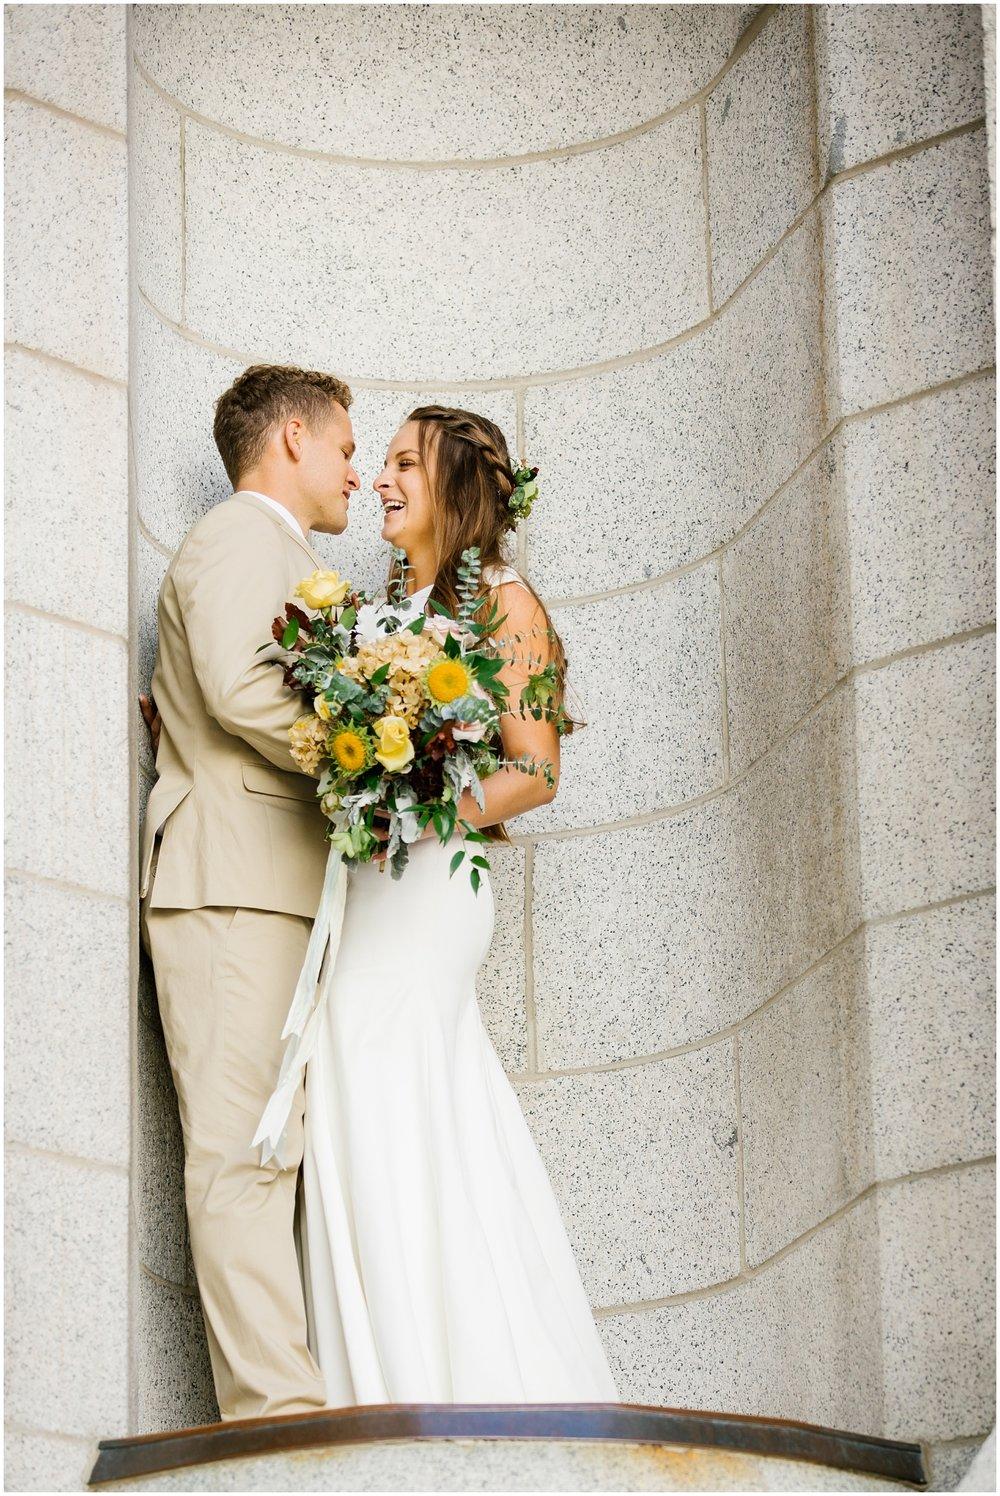 JC-Wedding-190_Lizzie-B-Imagery-Utah-Wedding-Photographer-Park-City-Salt-Lake-City-Temple-Joseph-Smith-Memorial-Building-Empire-Room.jpg